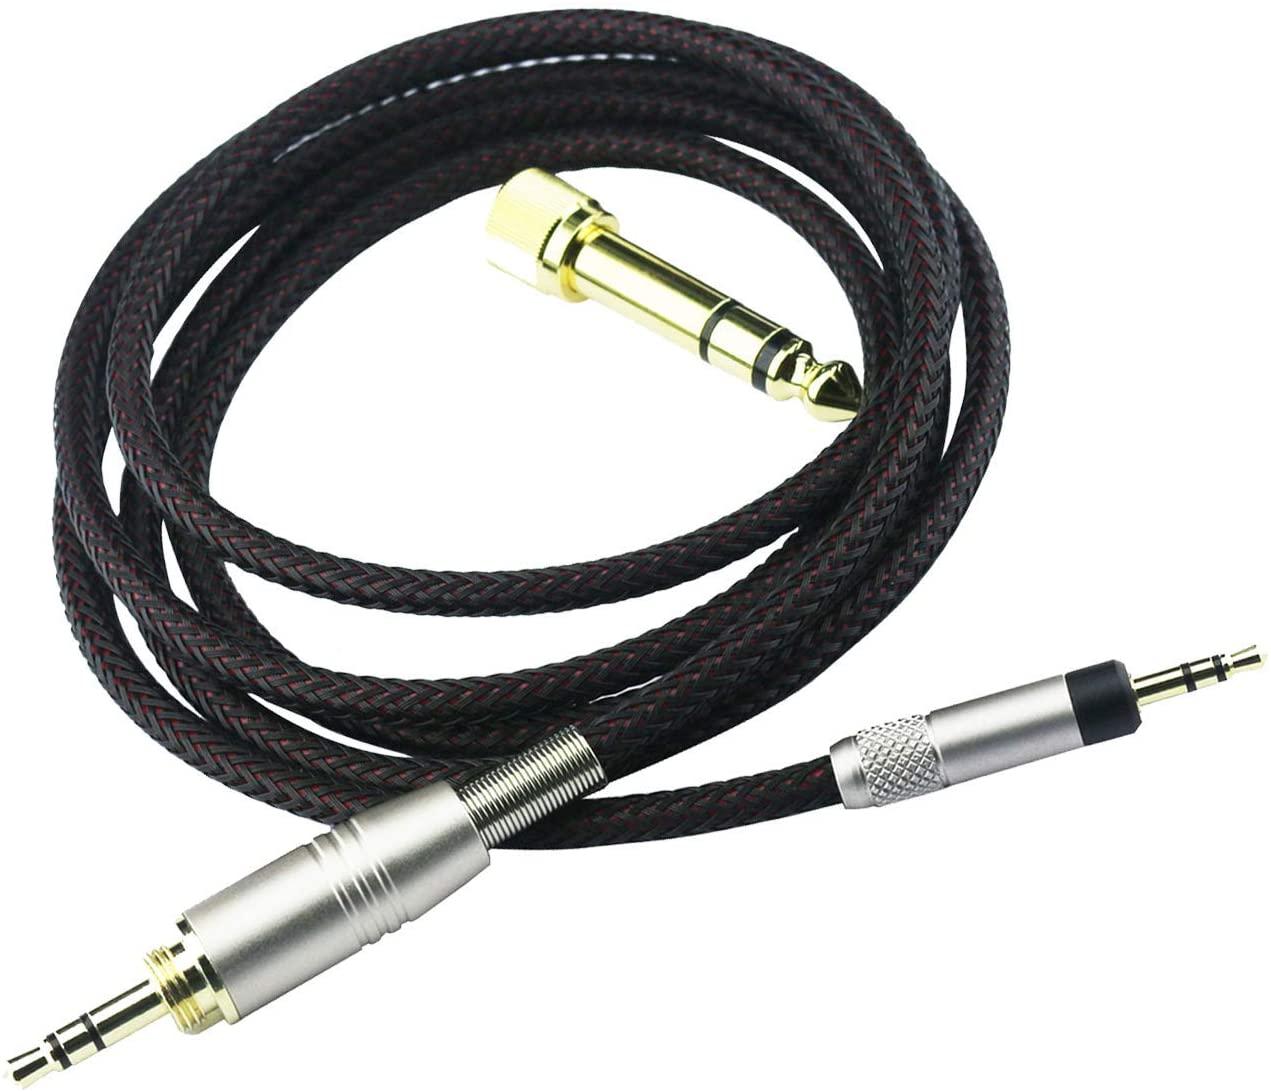 NewFantasia Replacement Audio Upgrade Cable Compatible with Bose QuietComfort 25, QuietComfort 35, QC25, QC35 II, QC35 Headphones 2meters/6feet